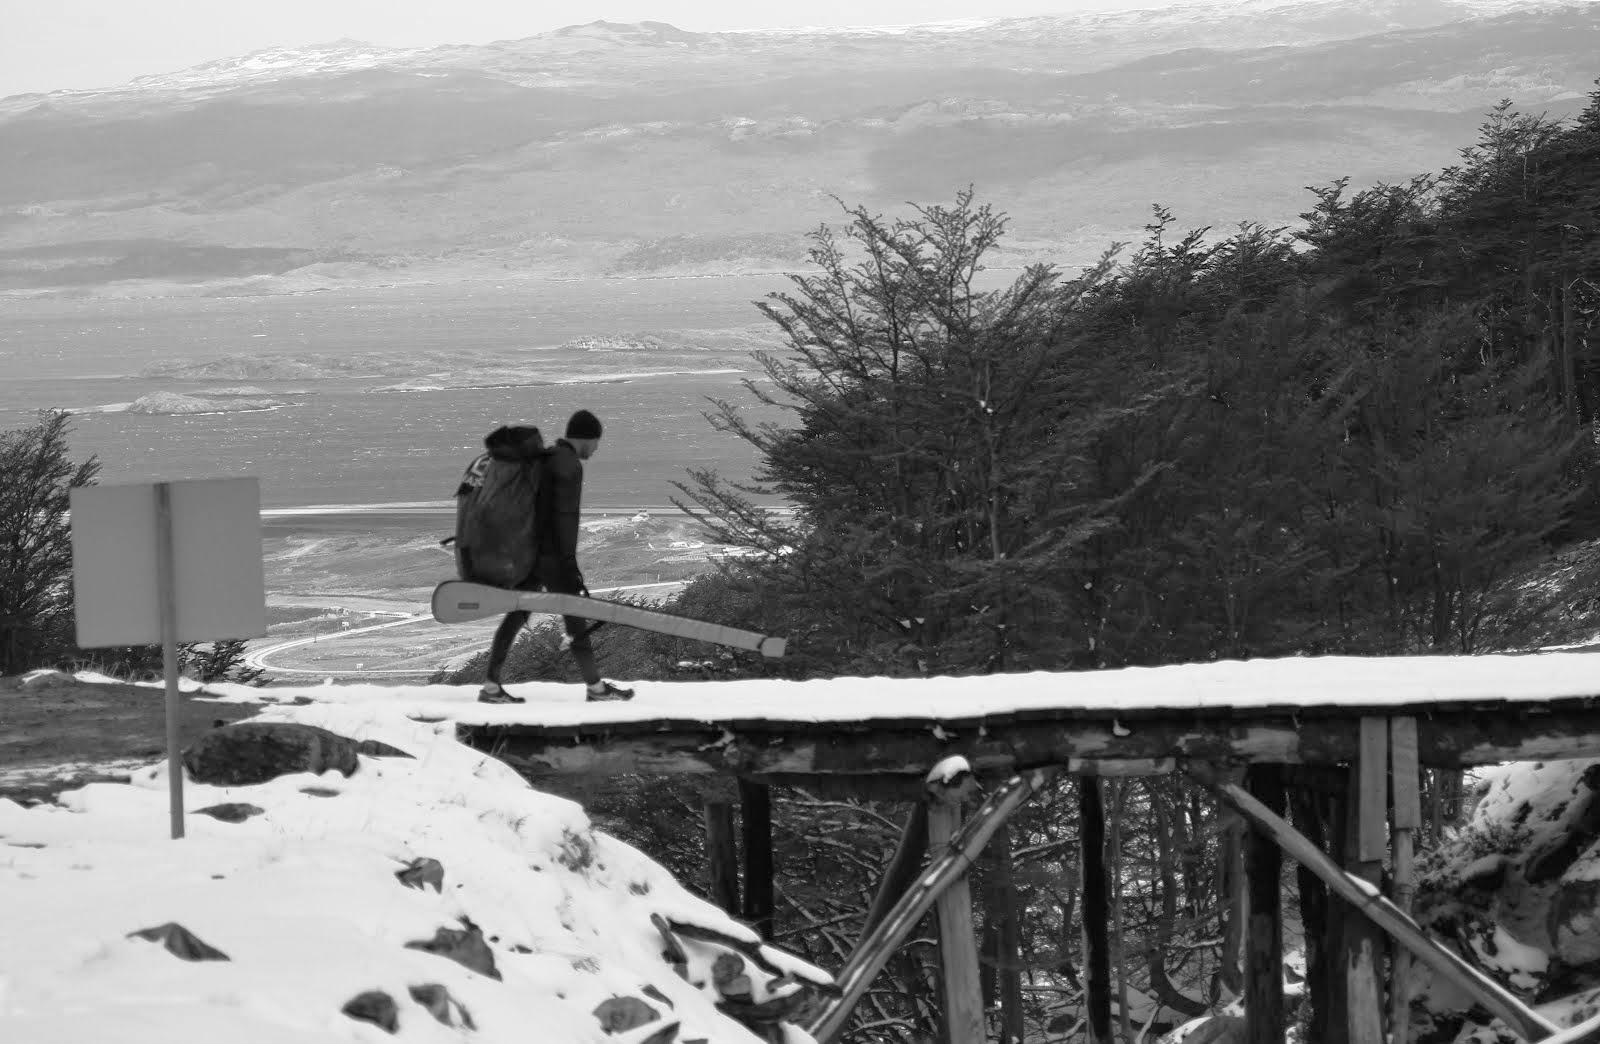 3º Episódio Ultra Paddle Run stand up paddle no fim do mundo(Ushuaia):